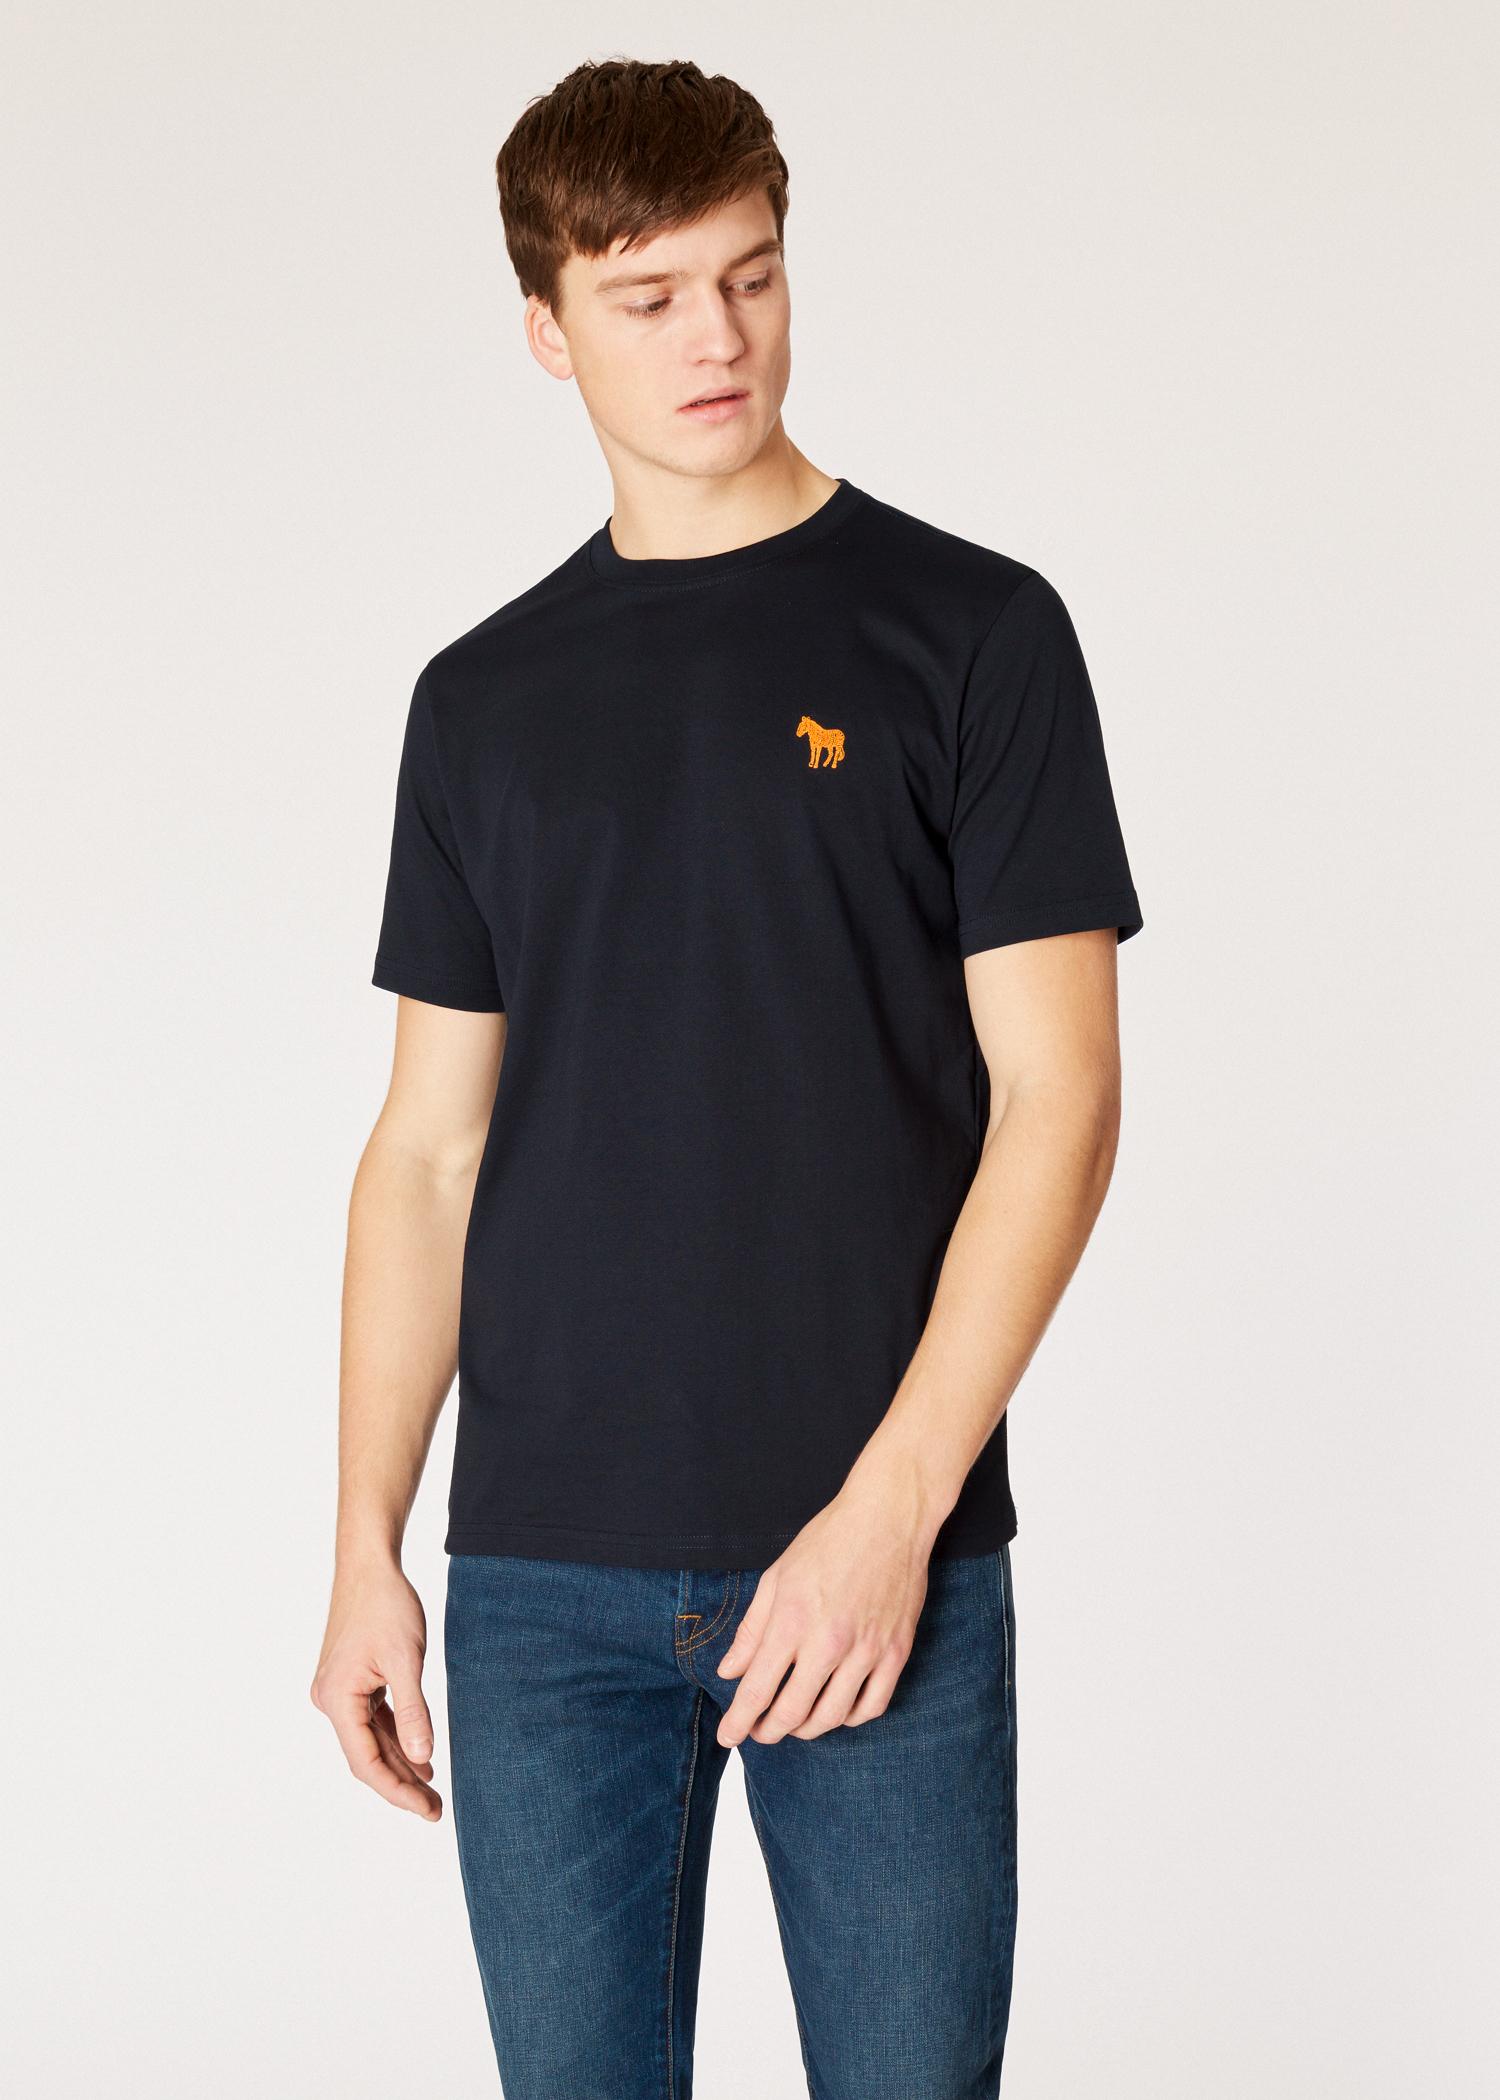 4ddf24c4da6 Men's Navy Embroidered Zebra Organic-Cotton T-Shirt - Paul Smith Asia